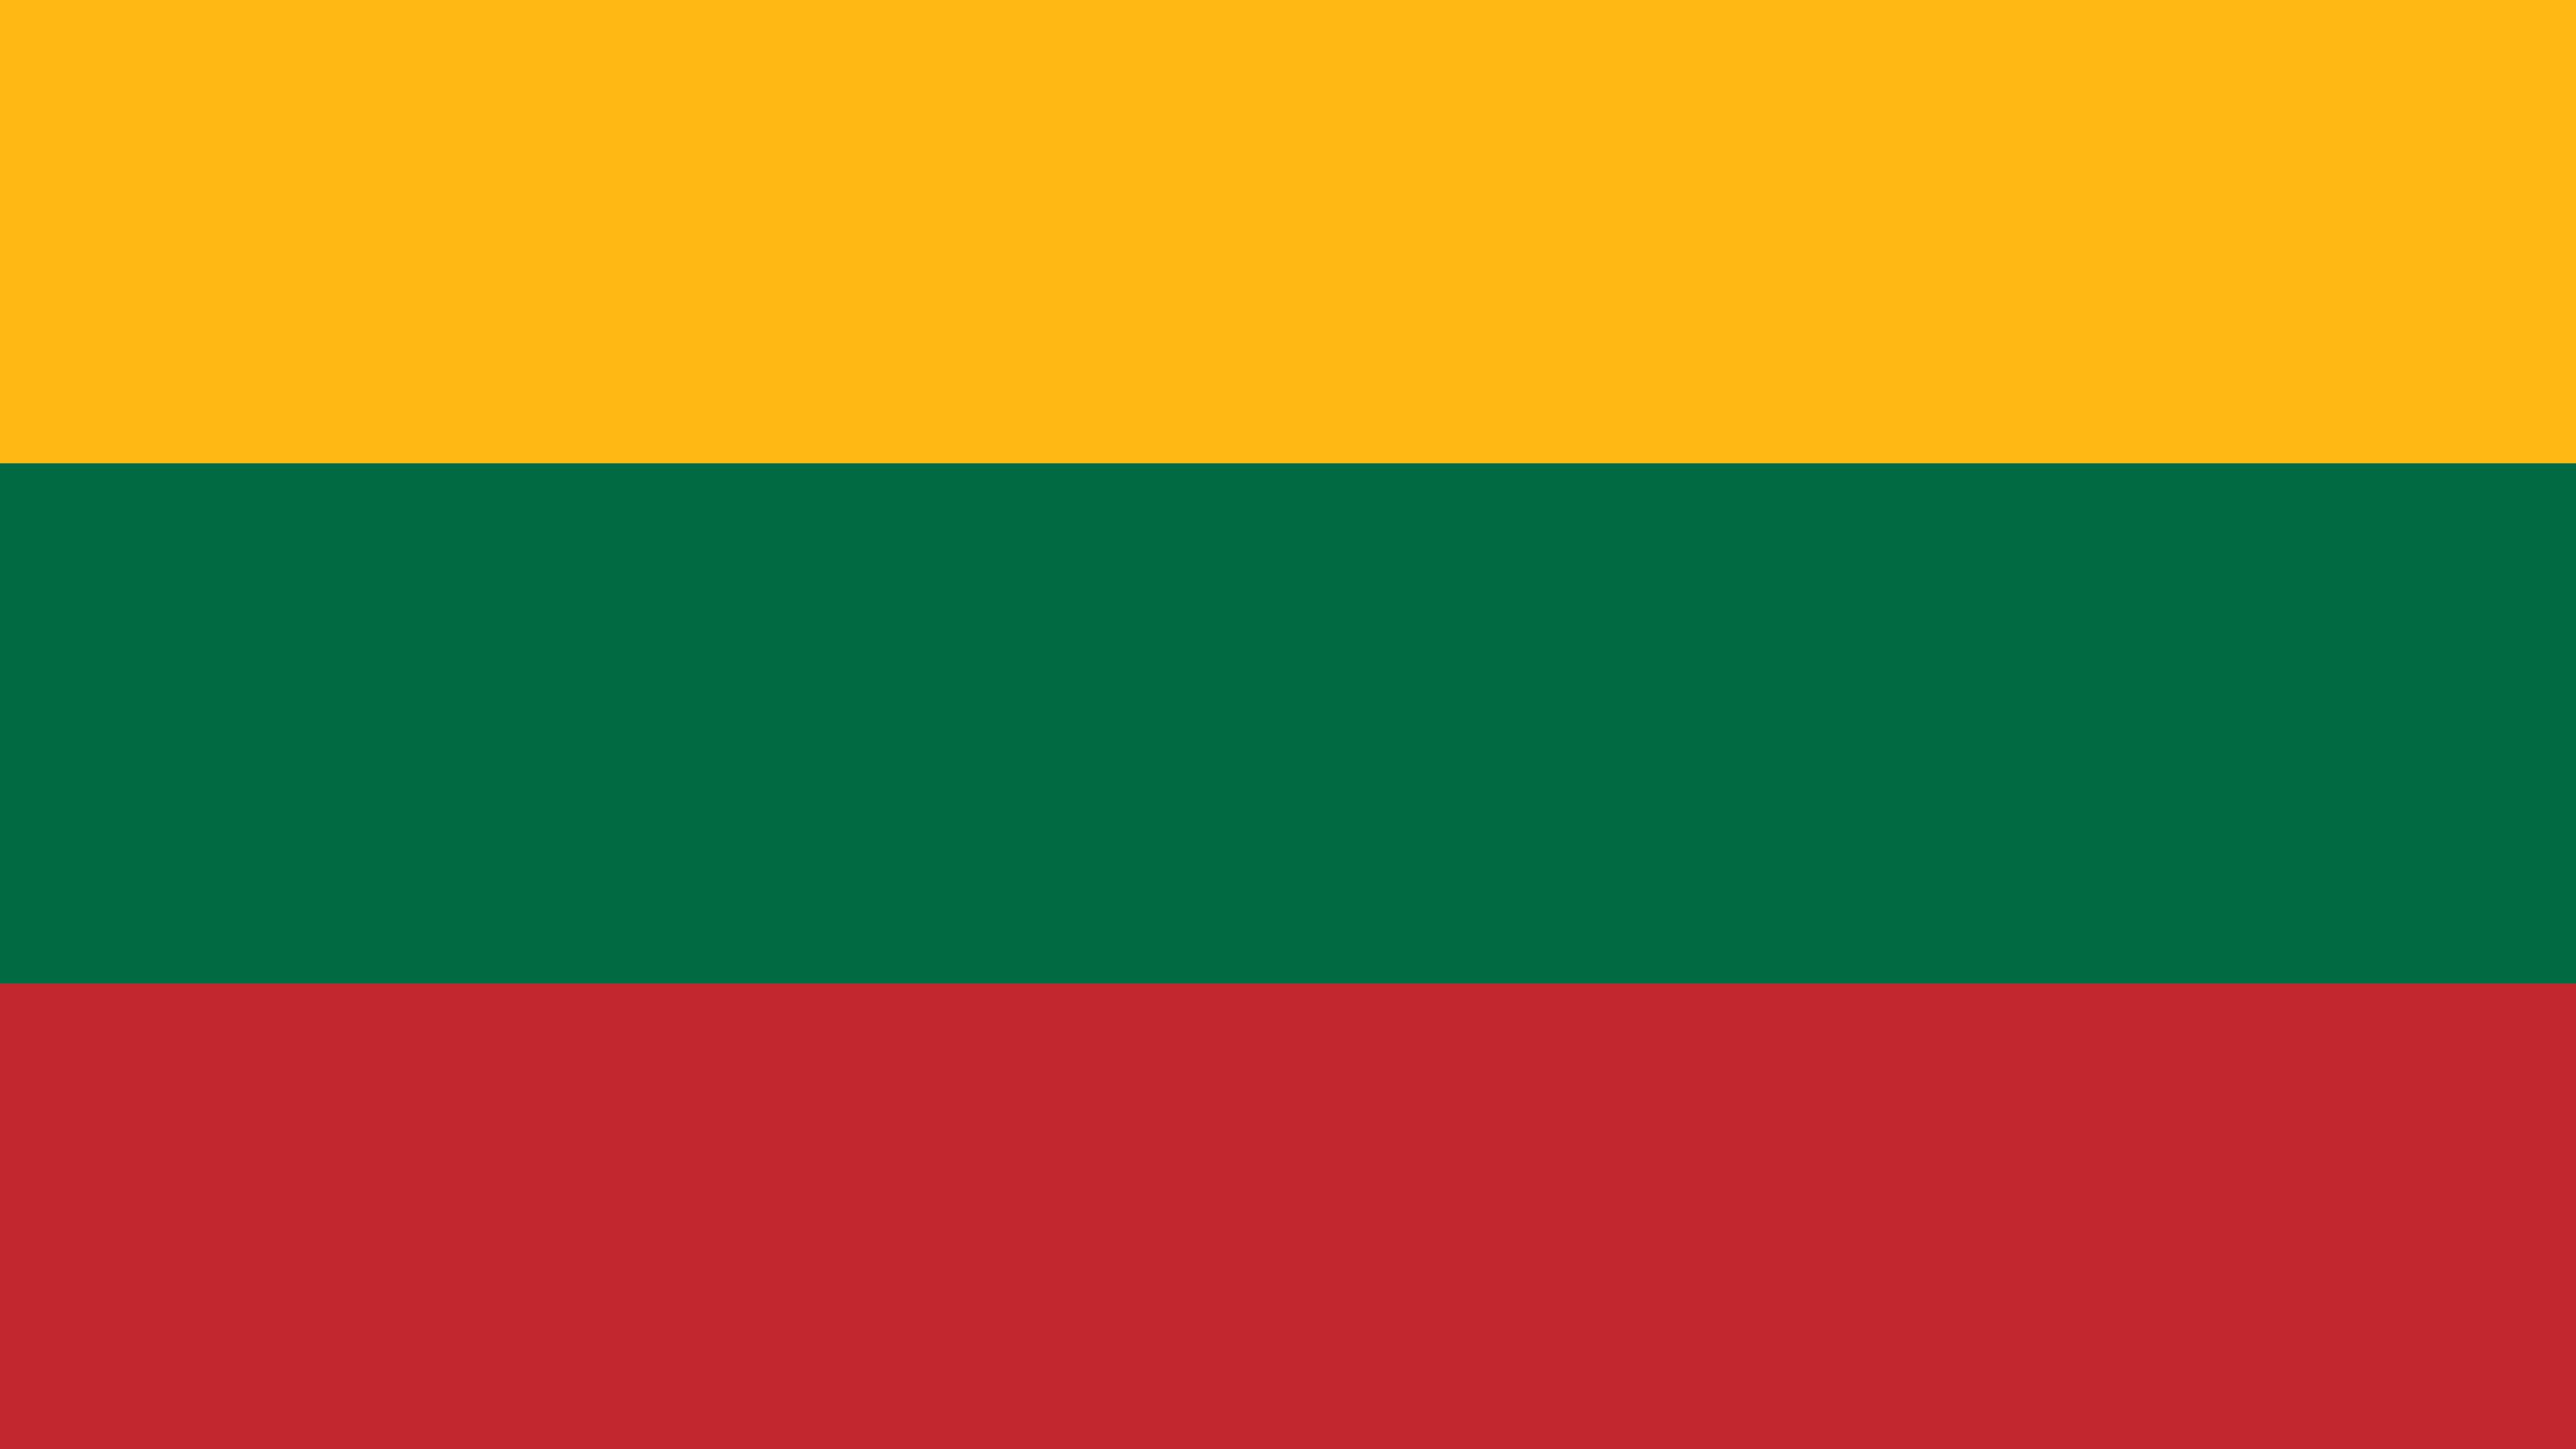 lithuania flag uhd 4k wallpaper